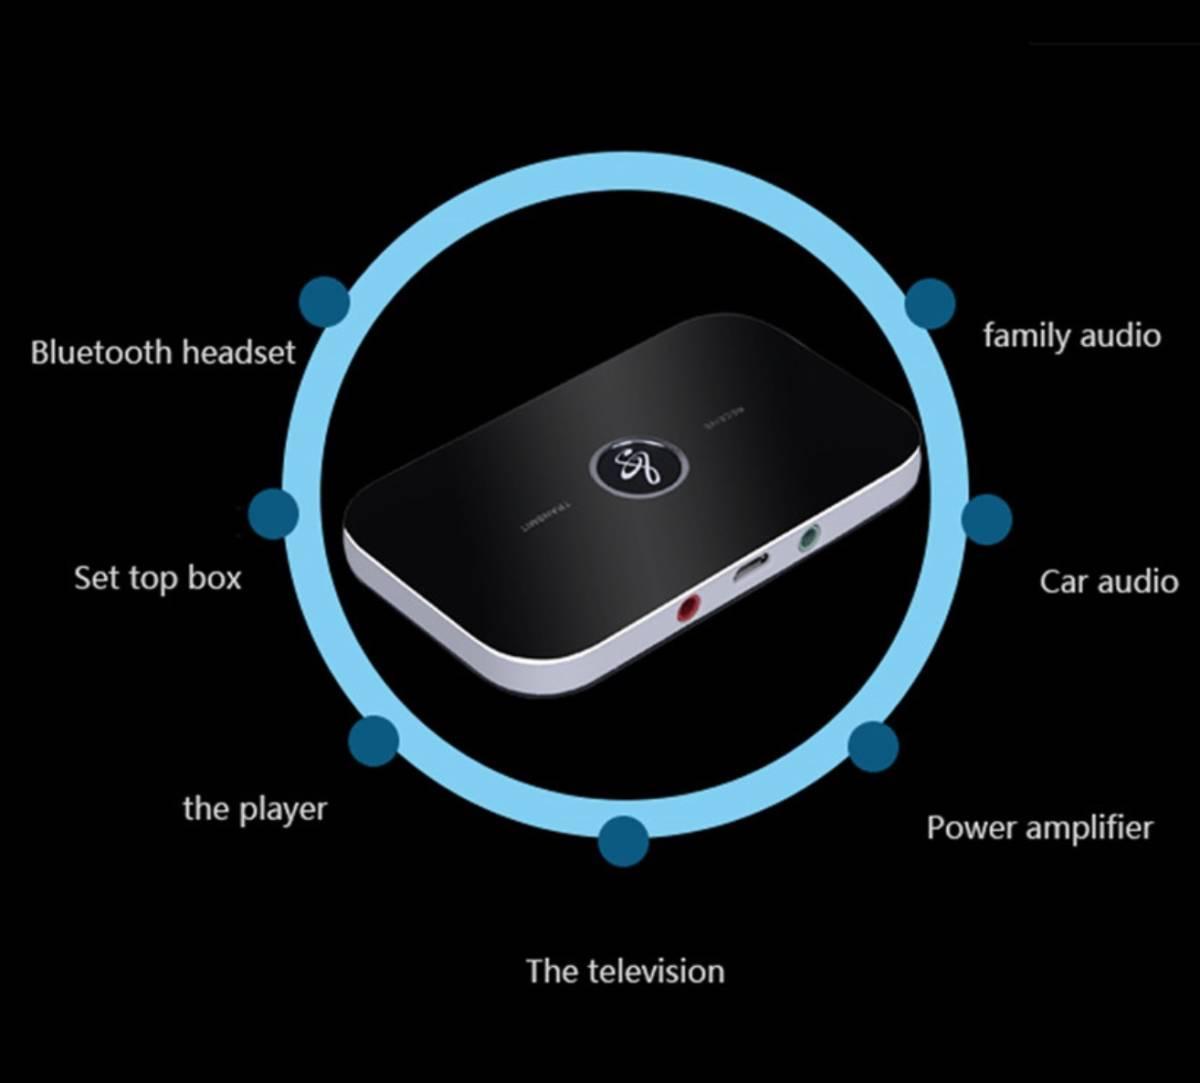 A672 bluetooth5.0 トランスミッター レシーバー ワイヤレスオーディオ B6 3.5ミリメートル aux 音楽受信機_画像8